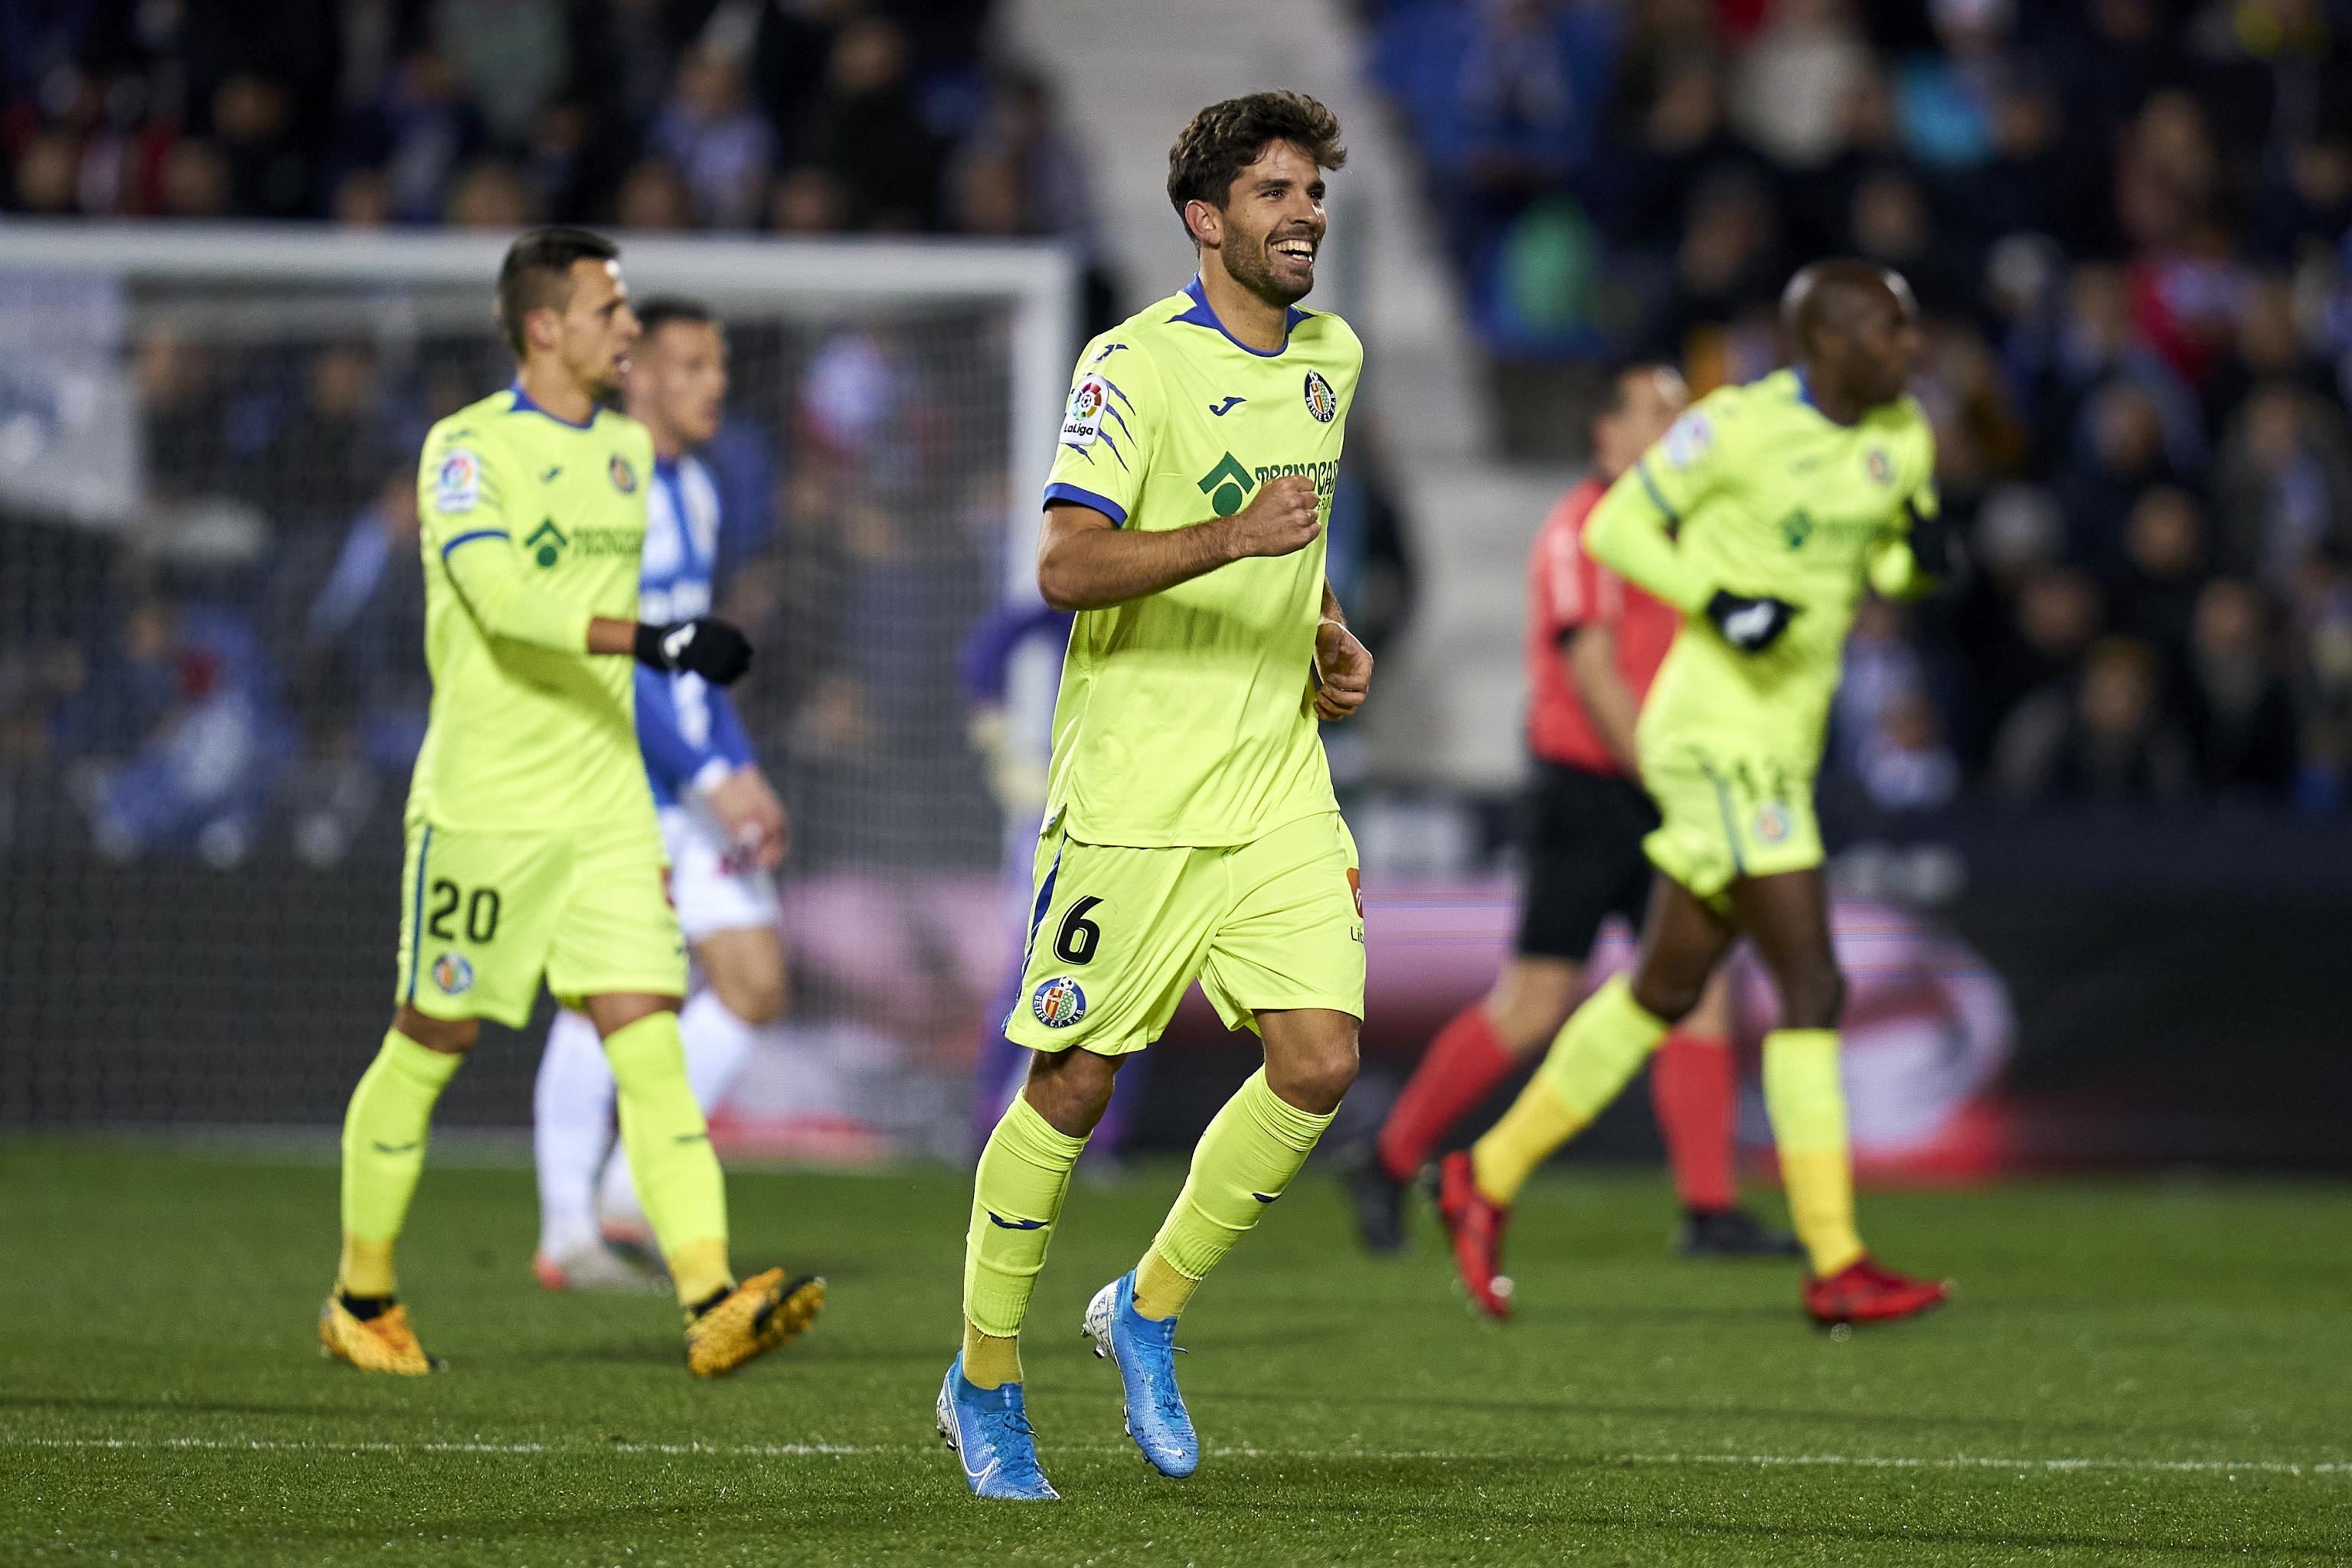 Chezmaitaipearls: La Liga Point Table 2019 To 2020